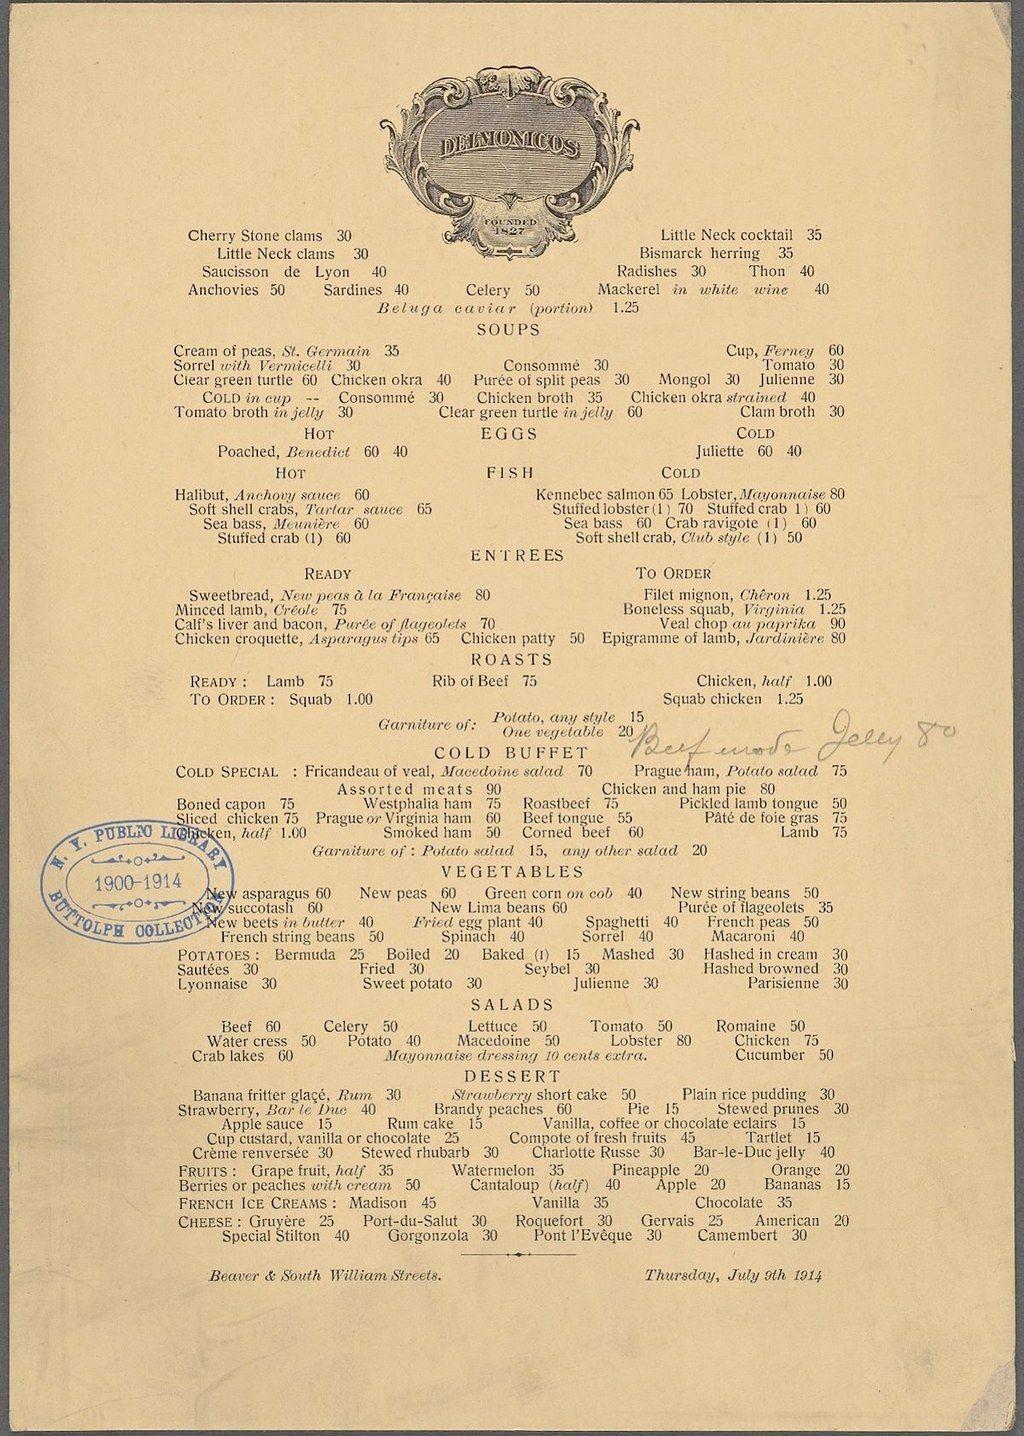 Delmonico's, 1914 vs. 2014 Nyc restaurants, Menu and